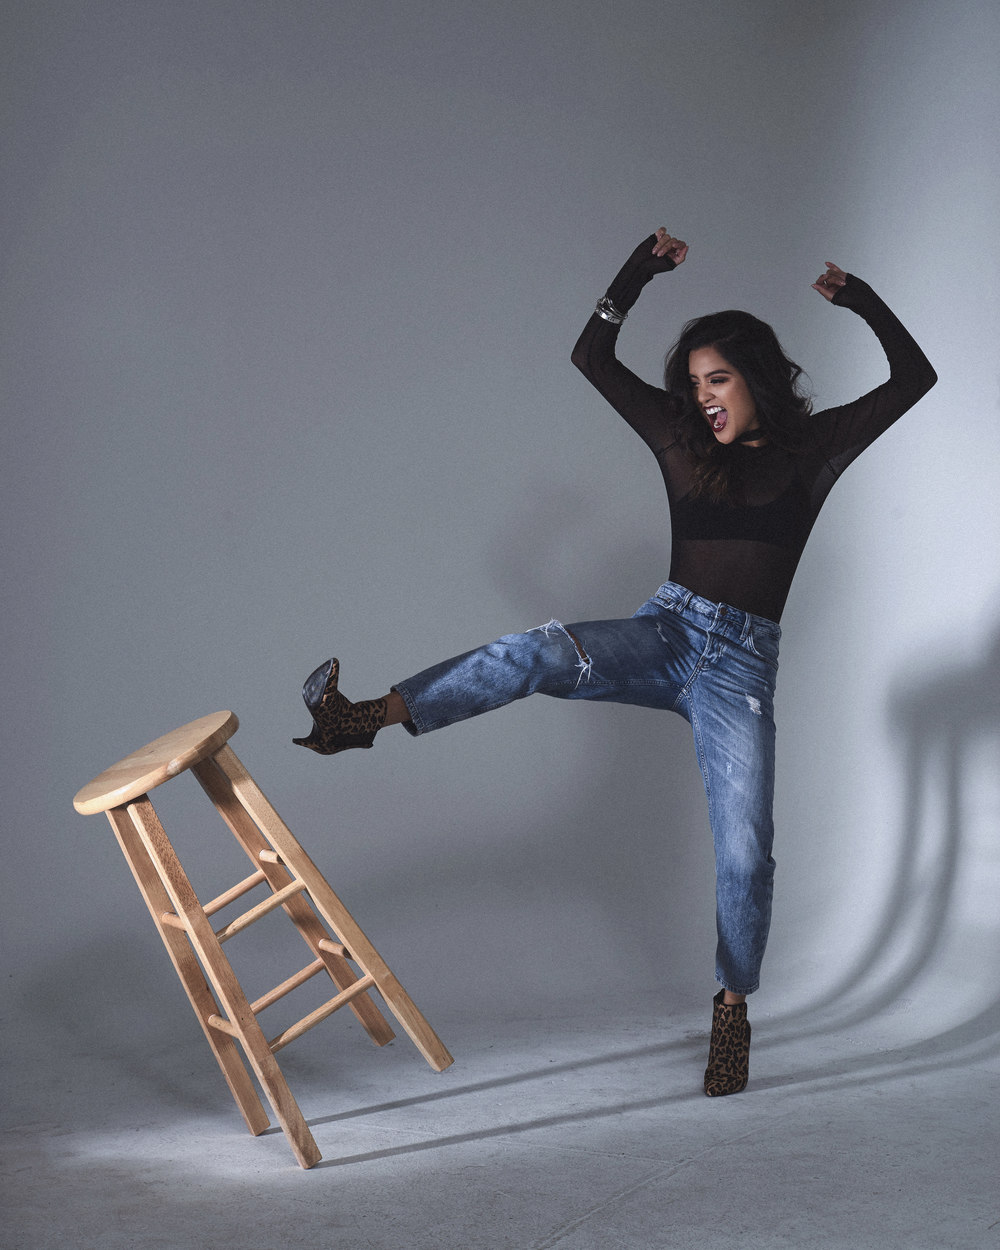 mg bodysuit   |   choker   |   f    p bralette   | topshop jeans   (s.)  | zara shoes   (s.)   | HMU   janah degillo  |photos by    sean martin